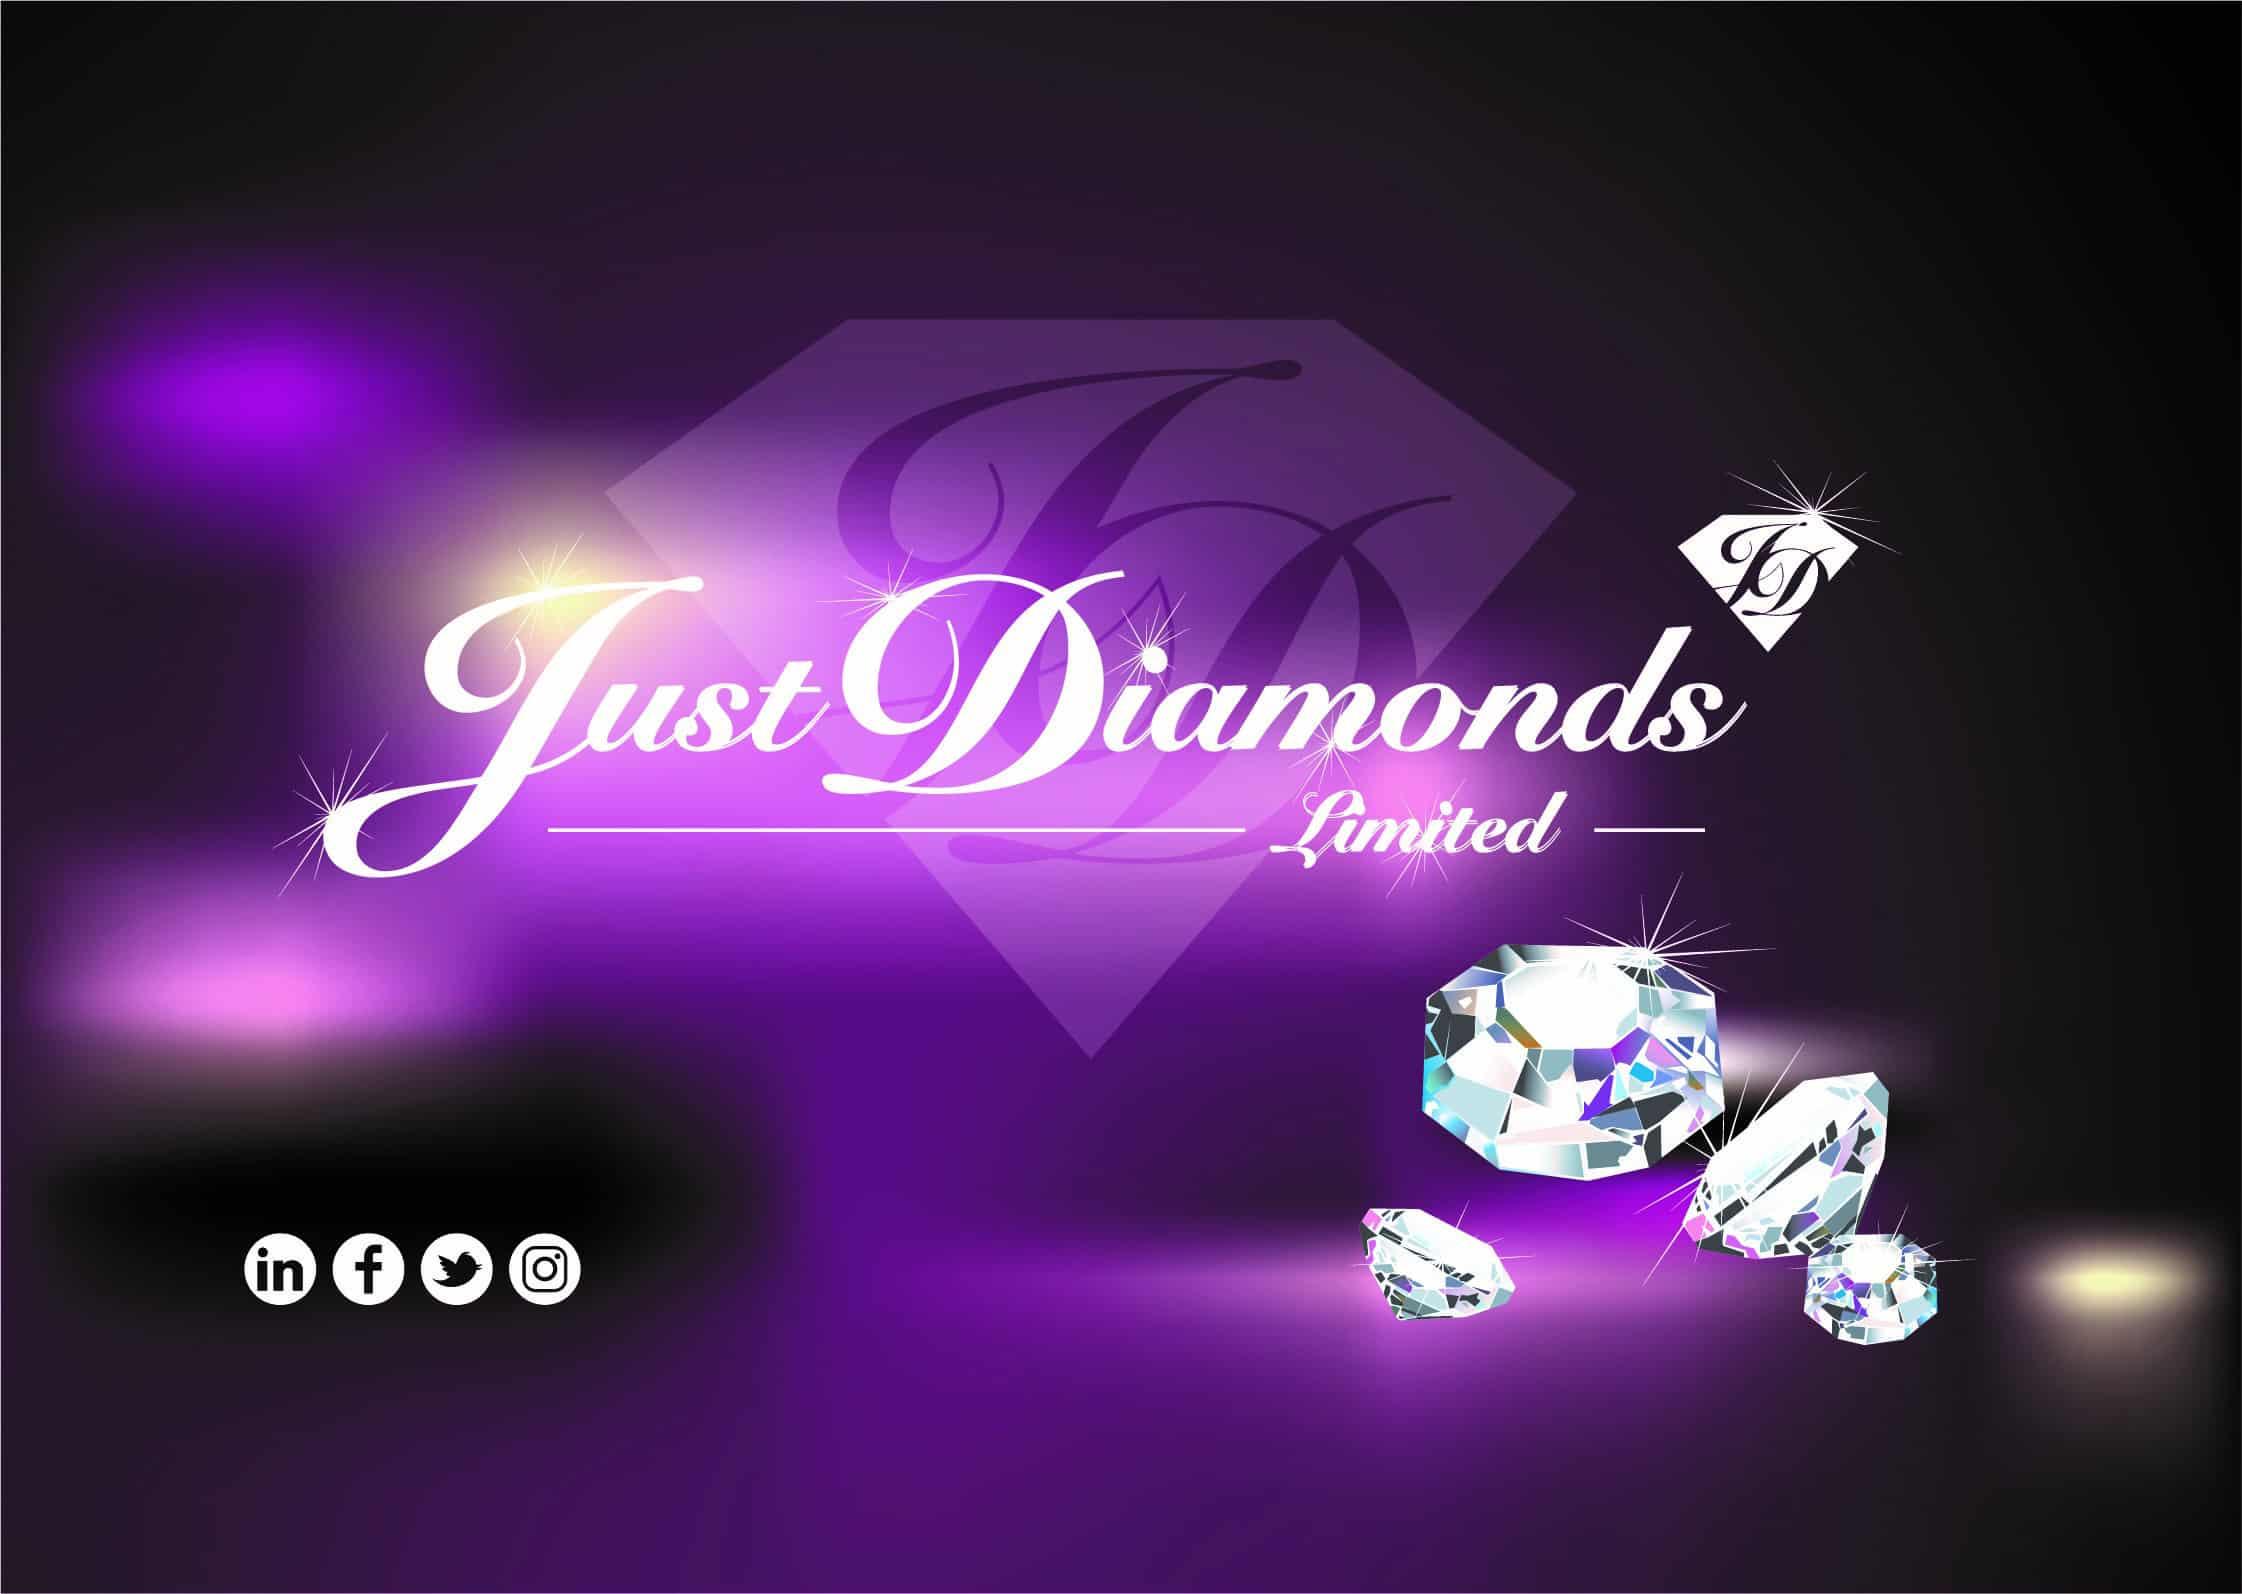 Just Diamonds business card